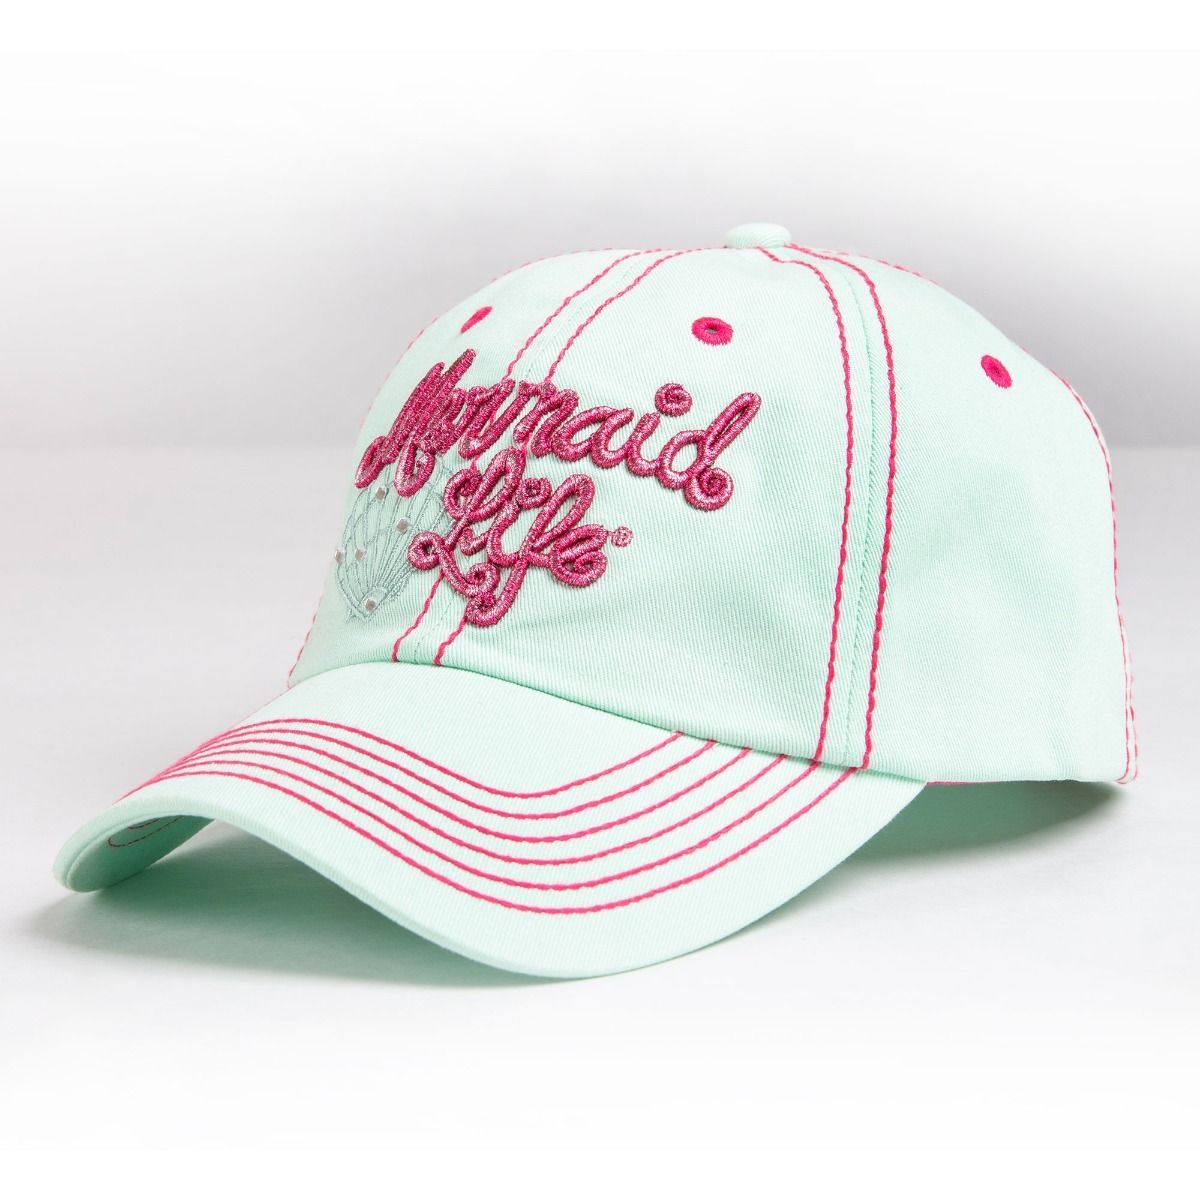 3279db8199fb6b Women's Fashion Shimmer & Shell Caps | Mermaid Life® Cap in Mint